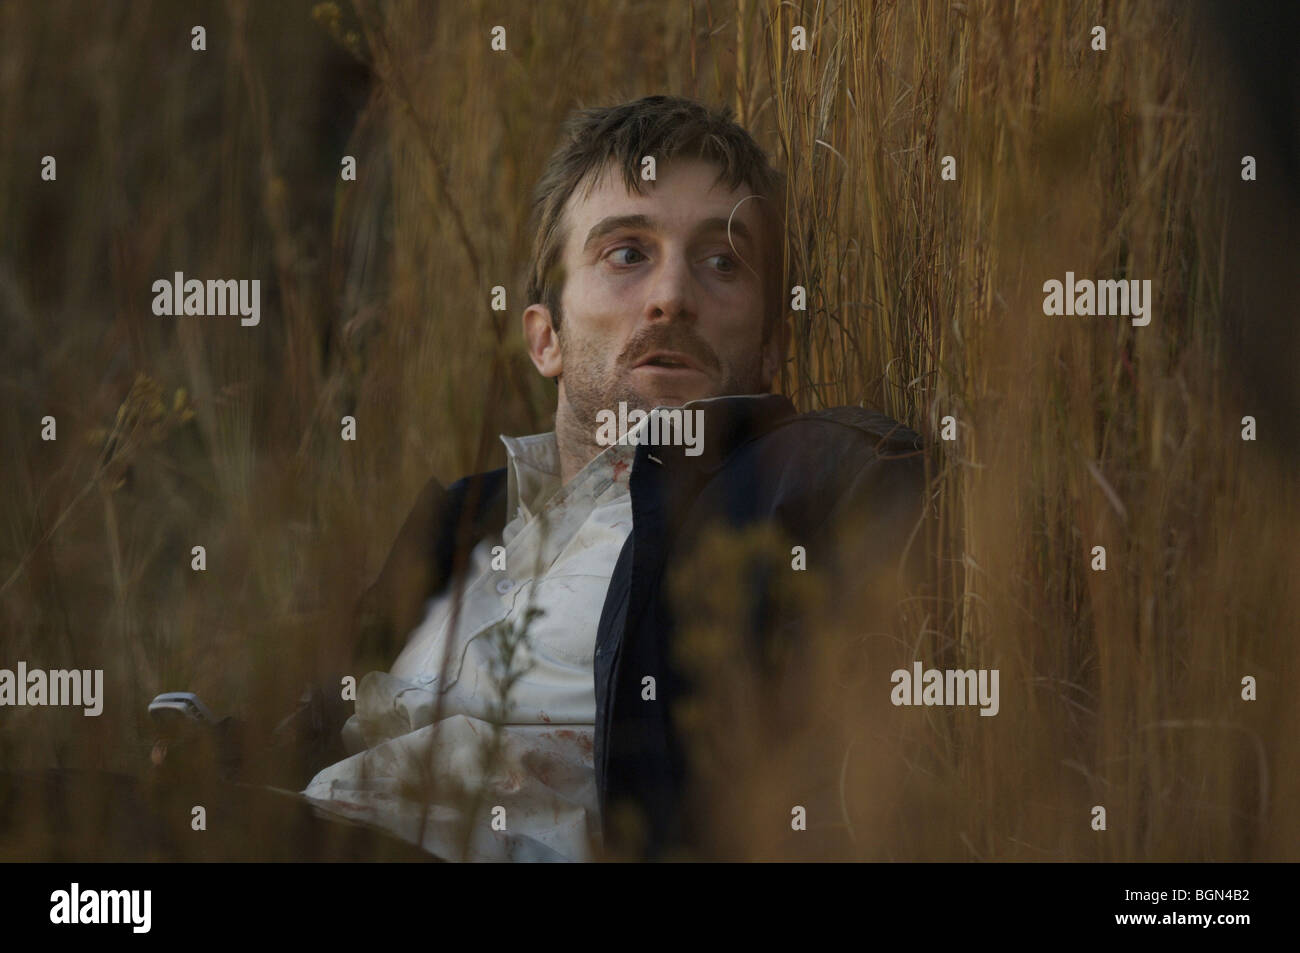 District 9 Year : 2009 Director : Neill Blomkamp Sharlto Copley - Stock Image